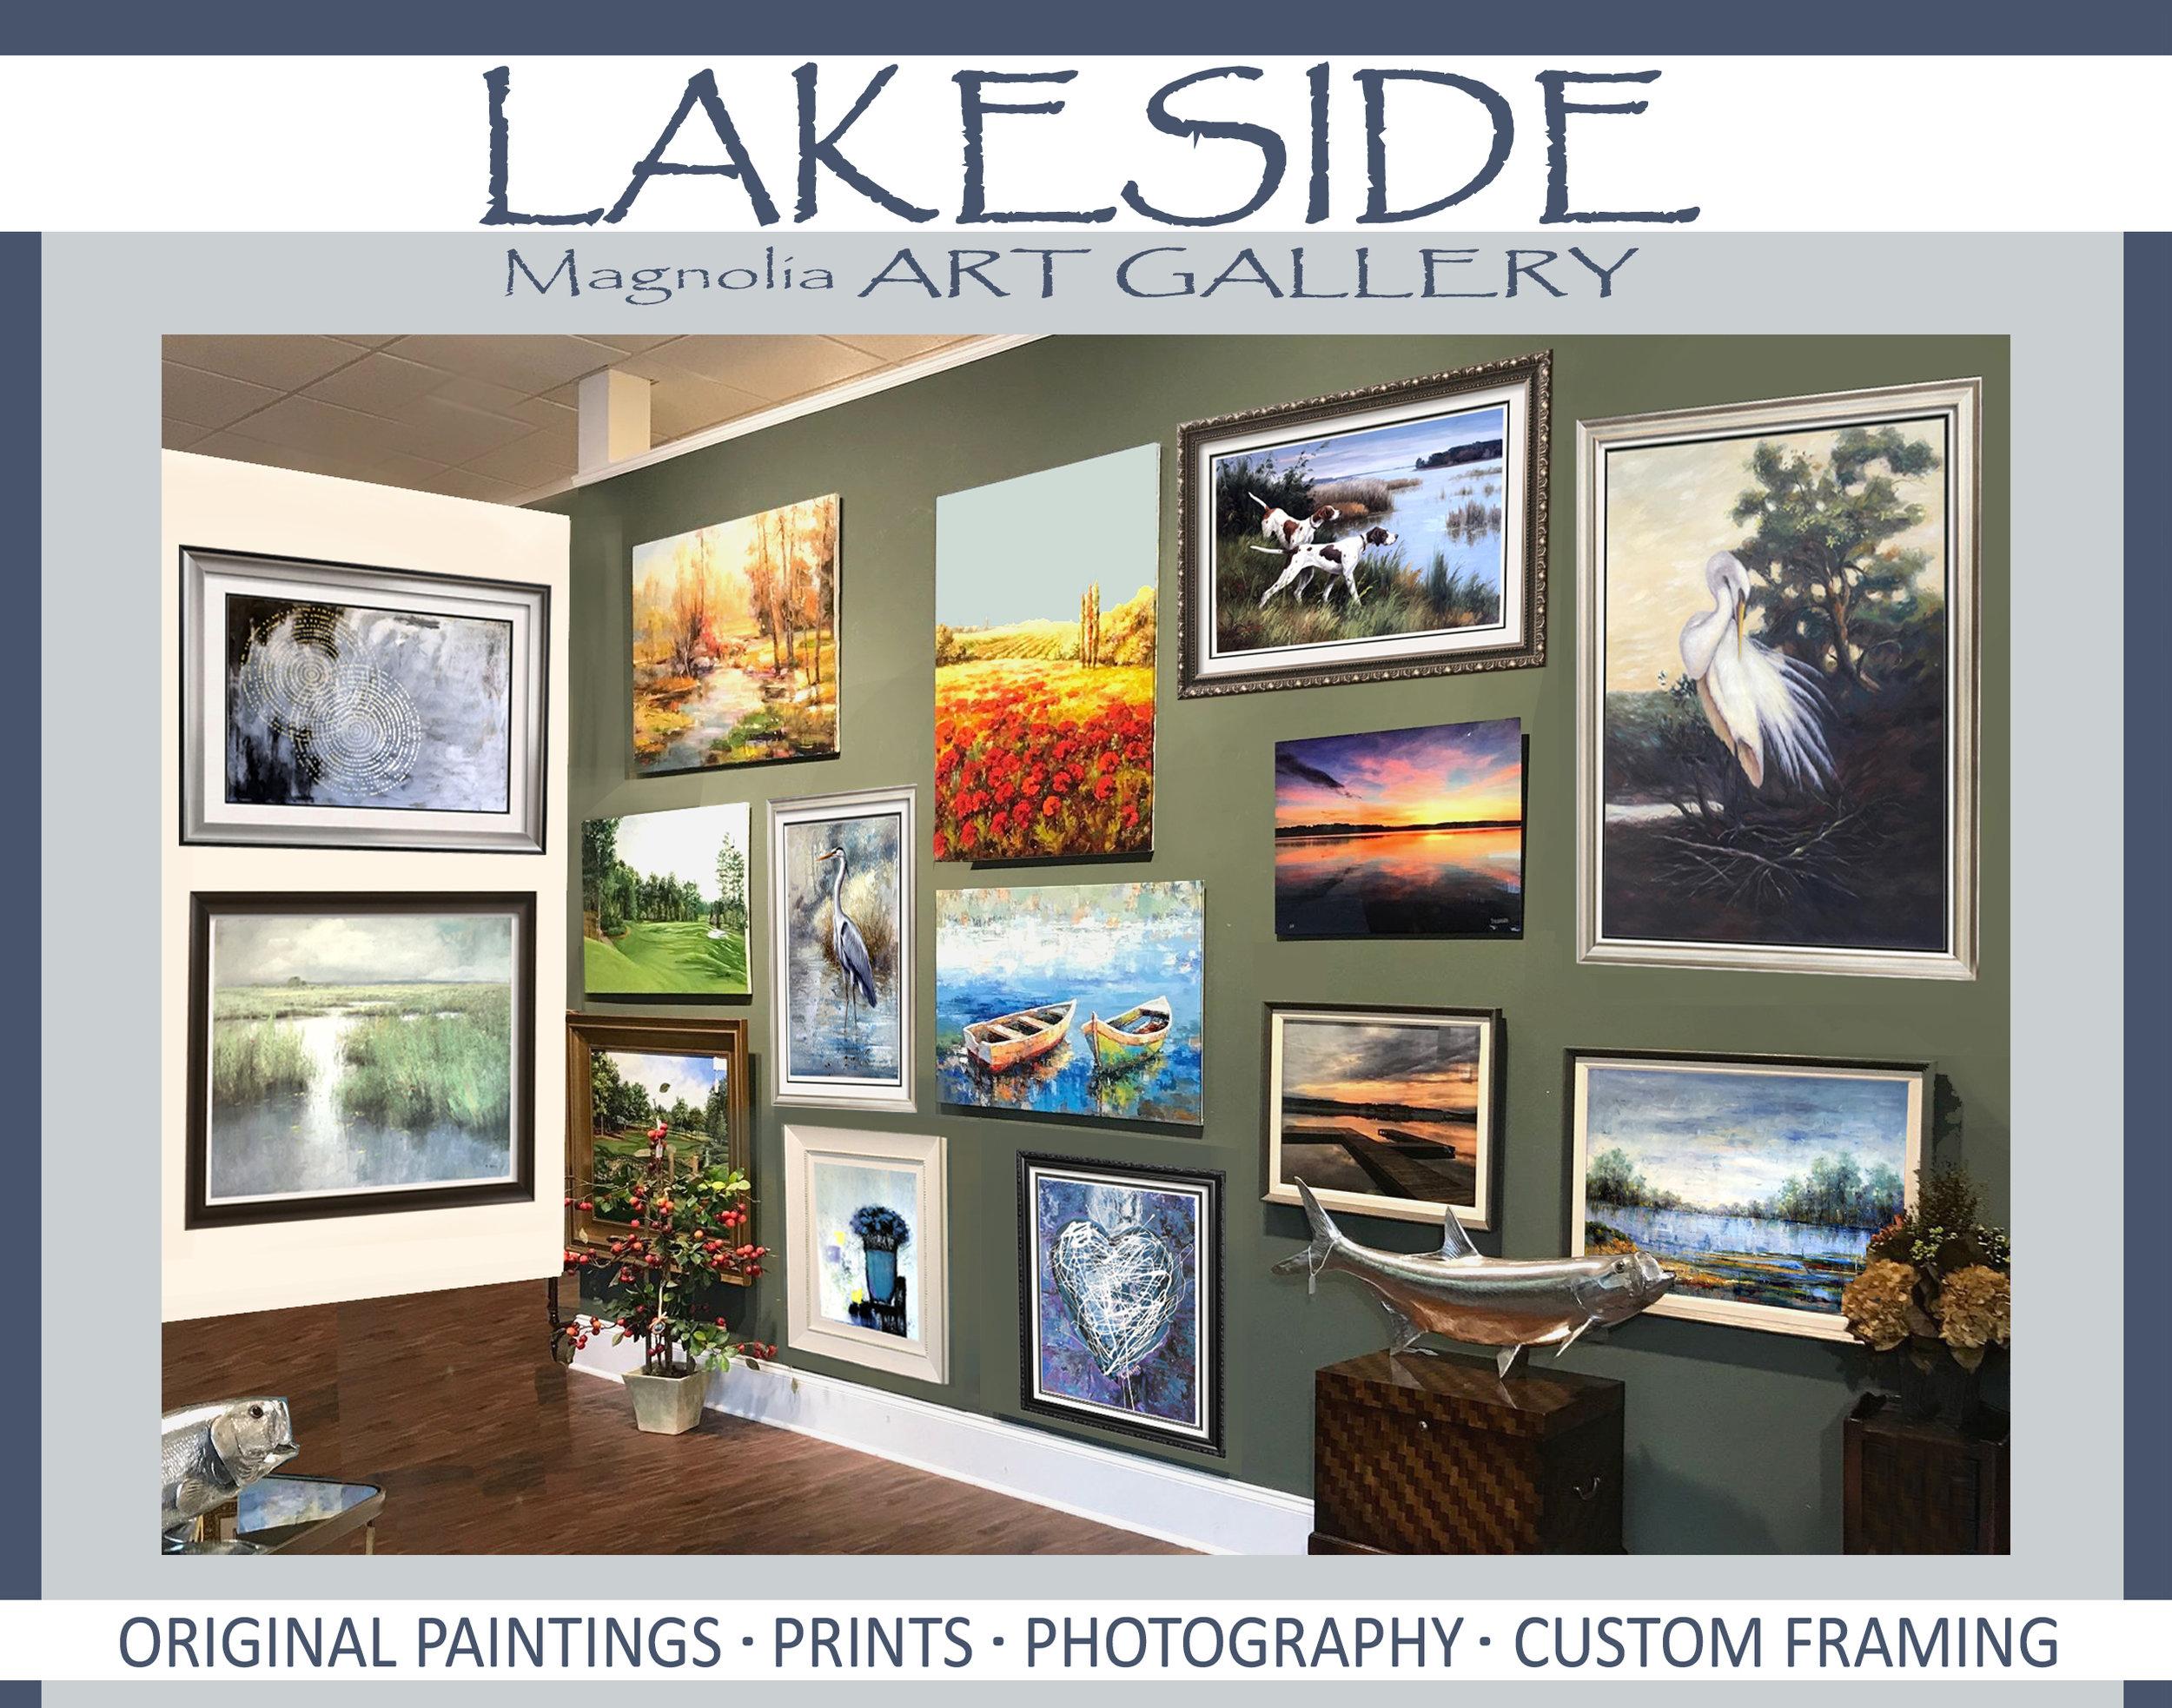 Lakeside Magnolia Art Gallery.jpg